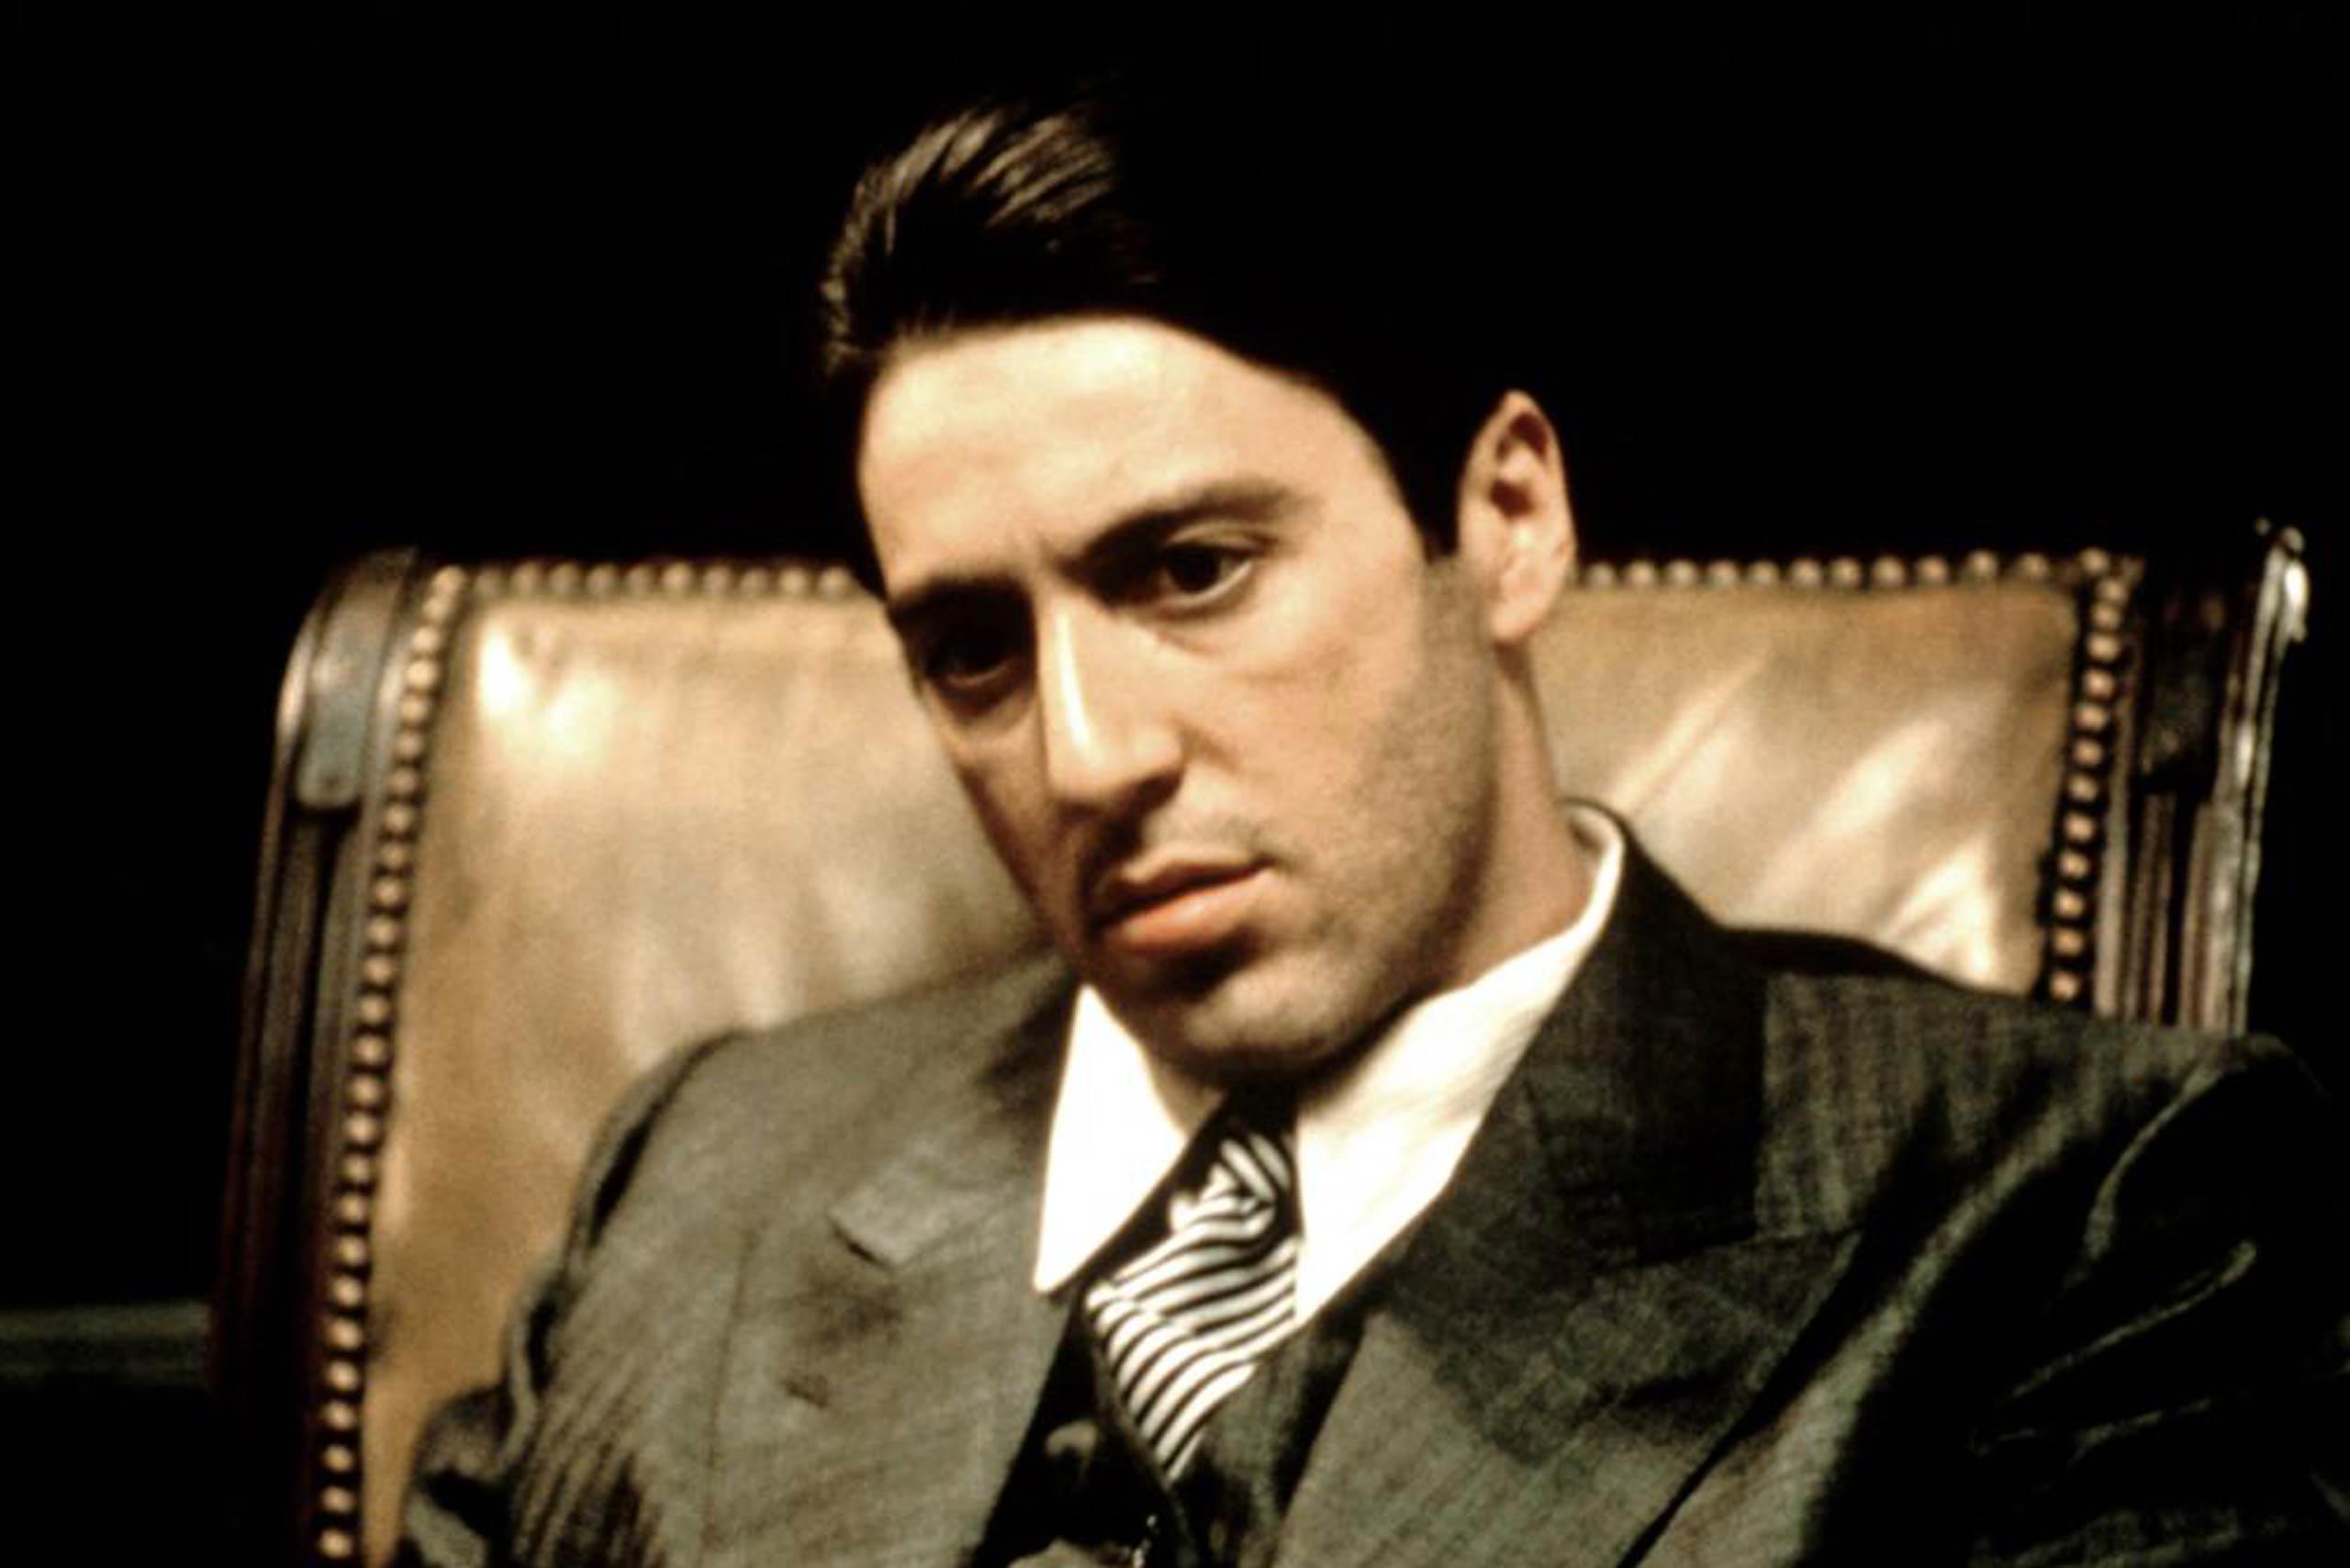 Michael Corleone - The Godfather, 1972